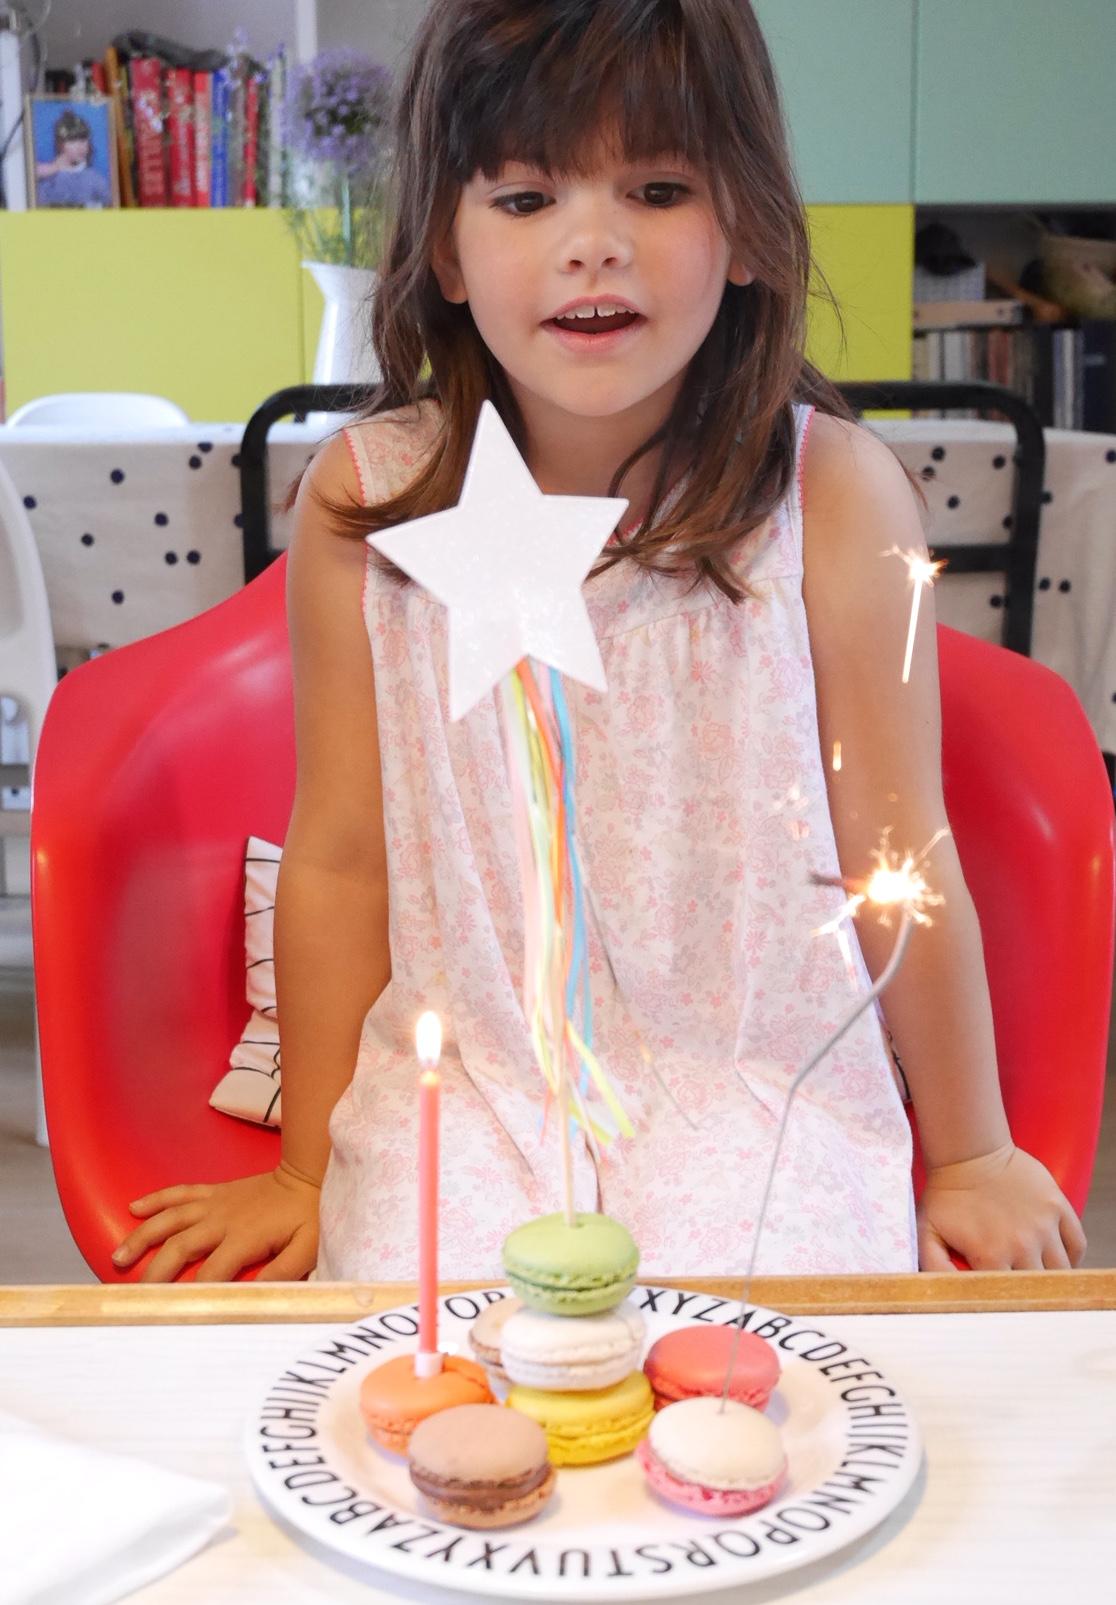 7 ans Louise - By Paulette